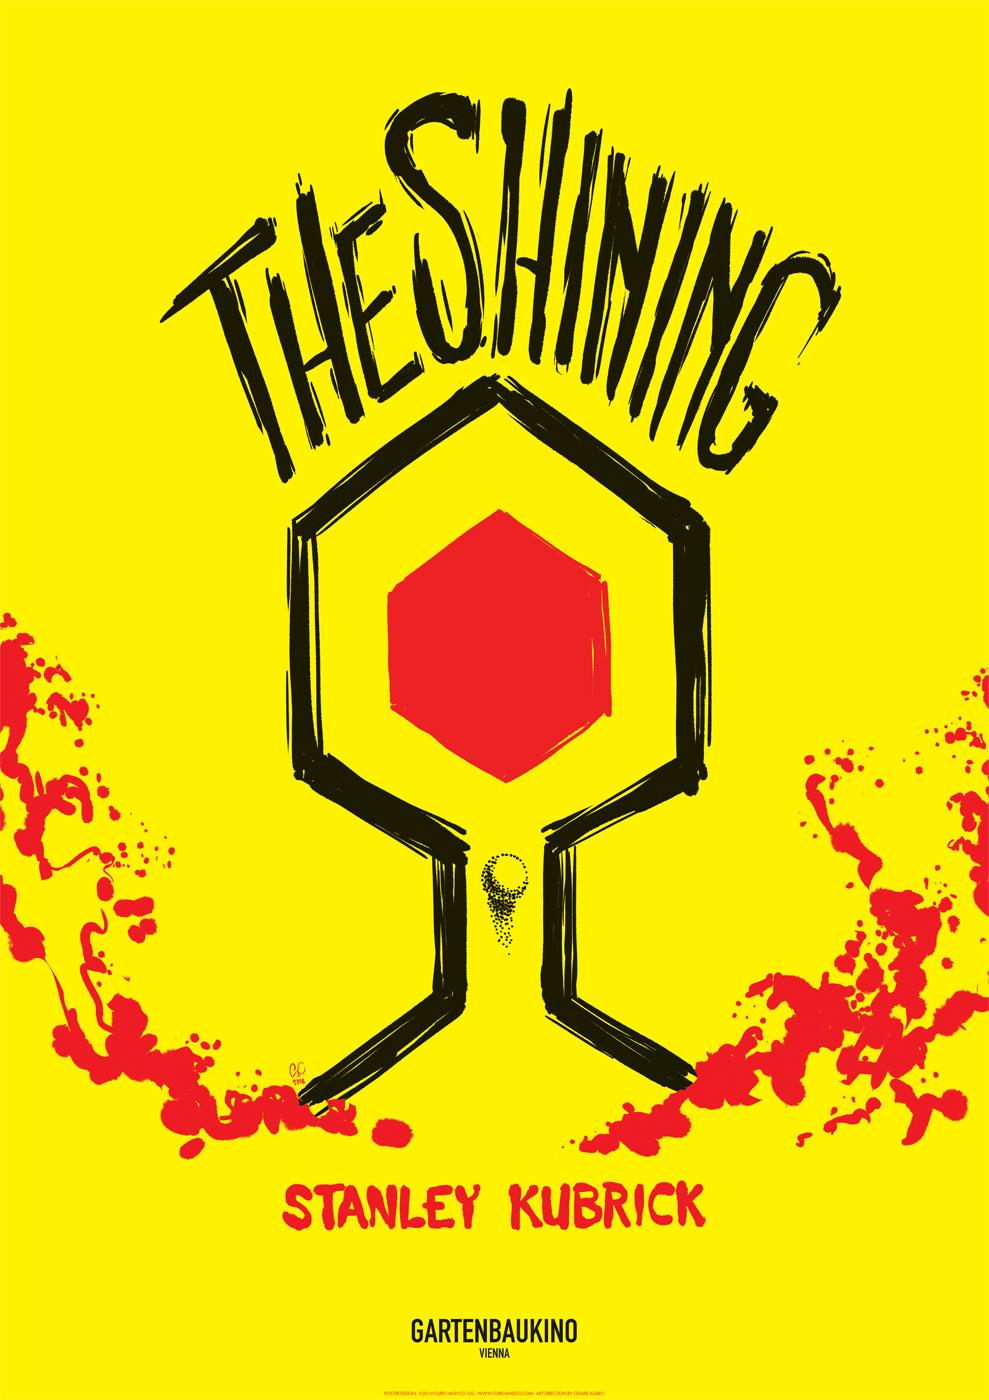 The Shining - Stanley Kubrick retrospective poster for Gartenbaukino